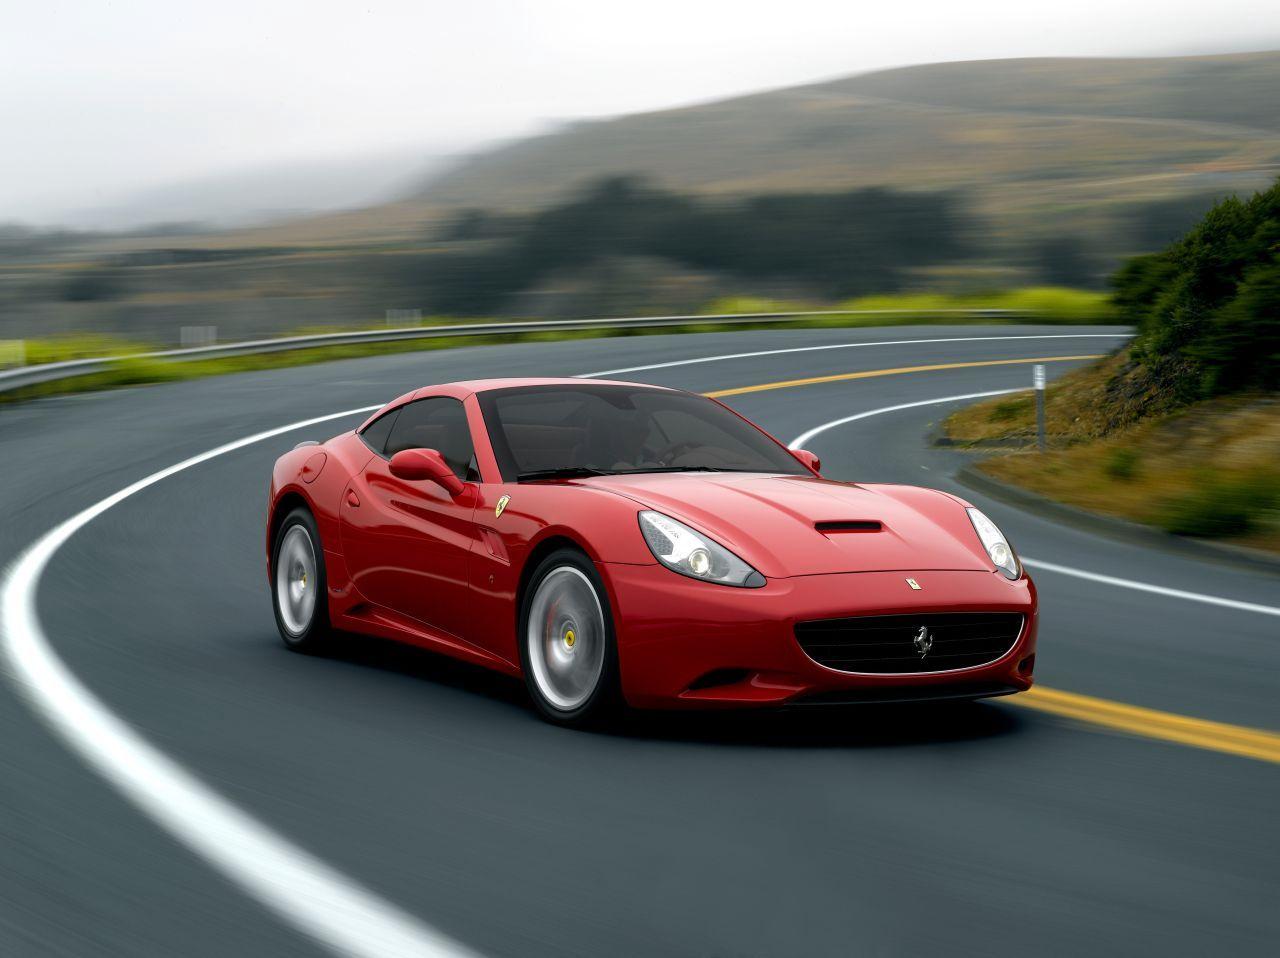 http://images.caradisiac.com/logos/1/1/7/0/171170/S0-Video-Une-Ferrari-California-a-moteur-biturbo-a-nouveau-surprise-86016.jpg